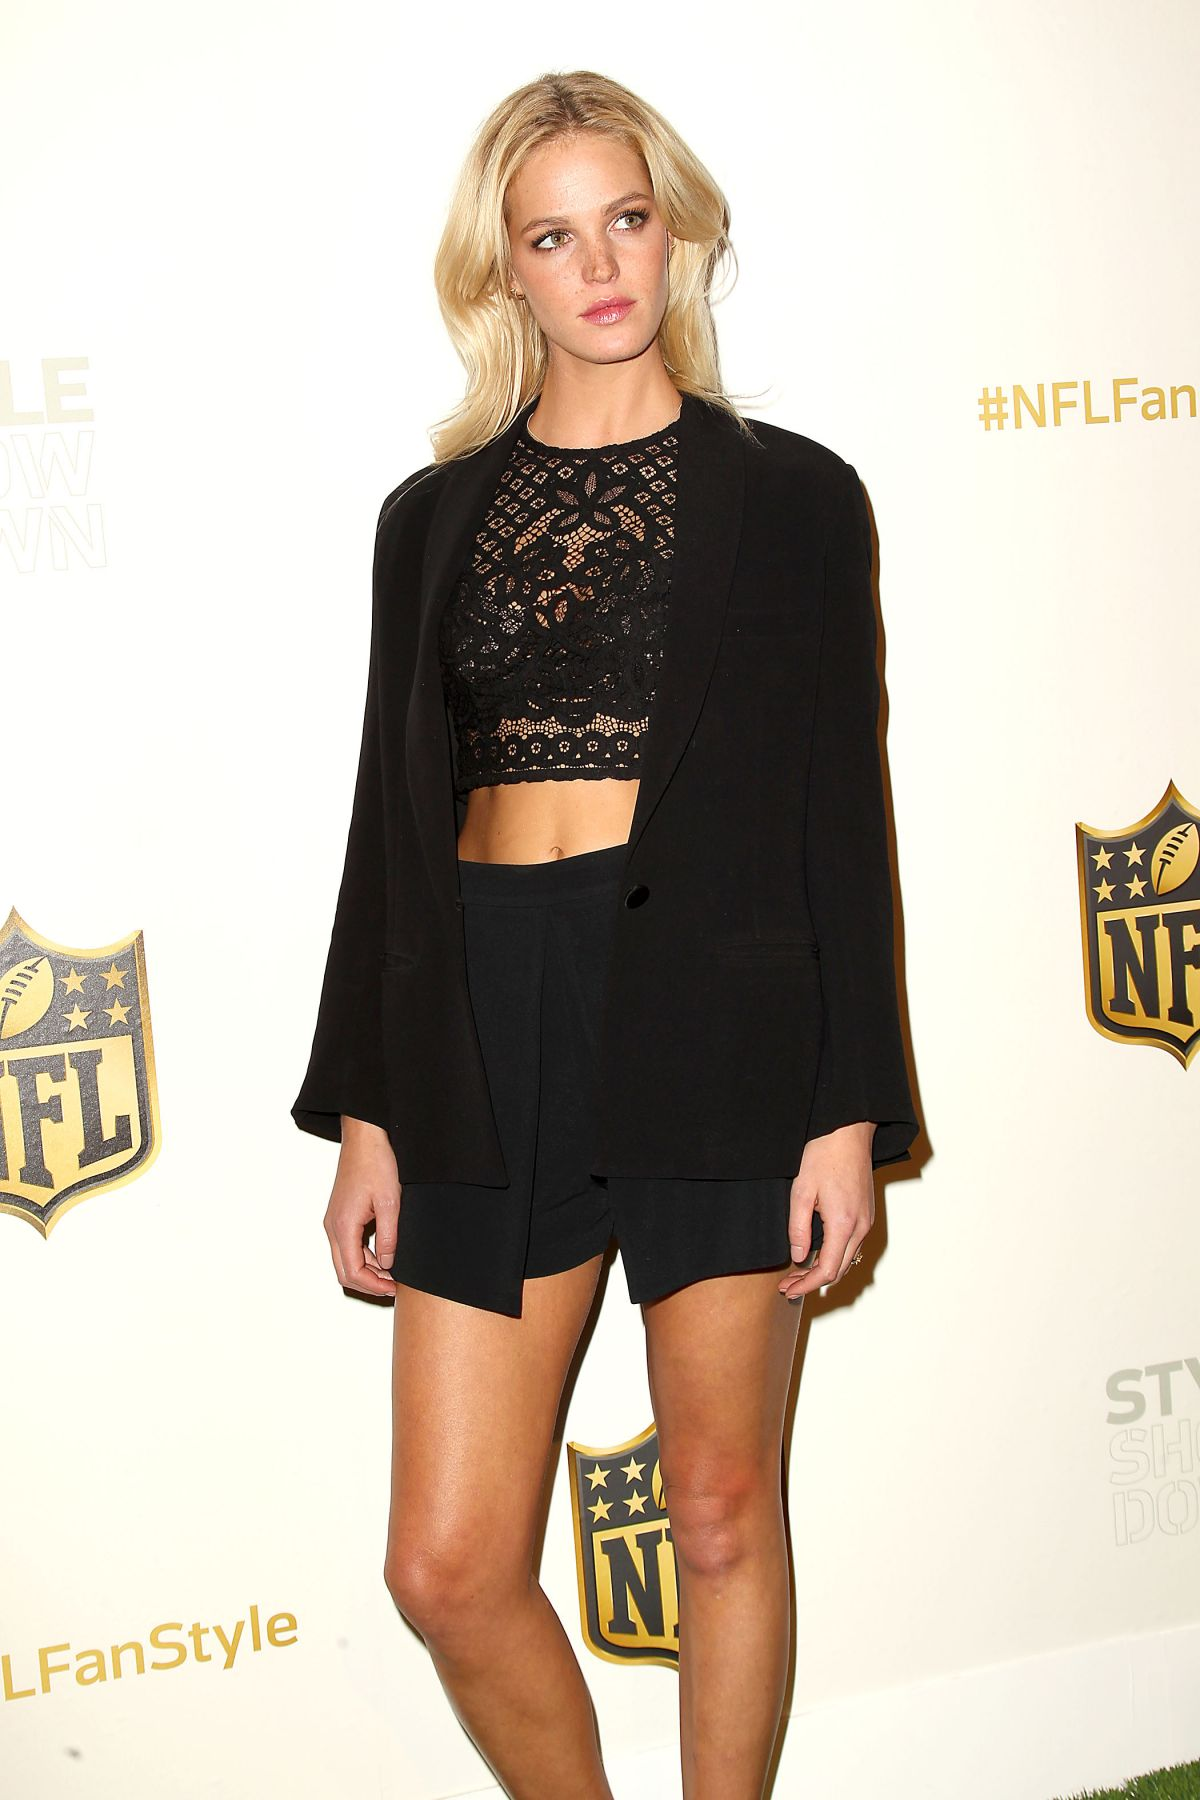 ERIN HEATHERTON at NFL Women's Style Showdown in New York 09/24/2015